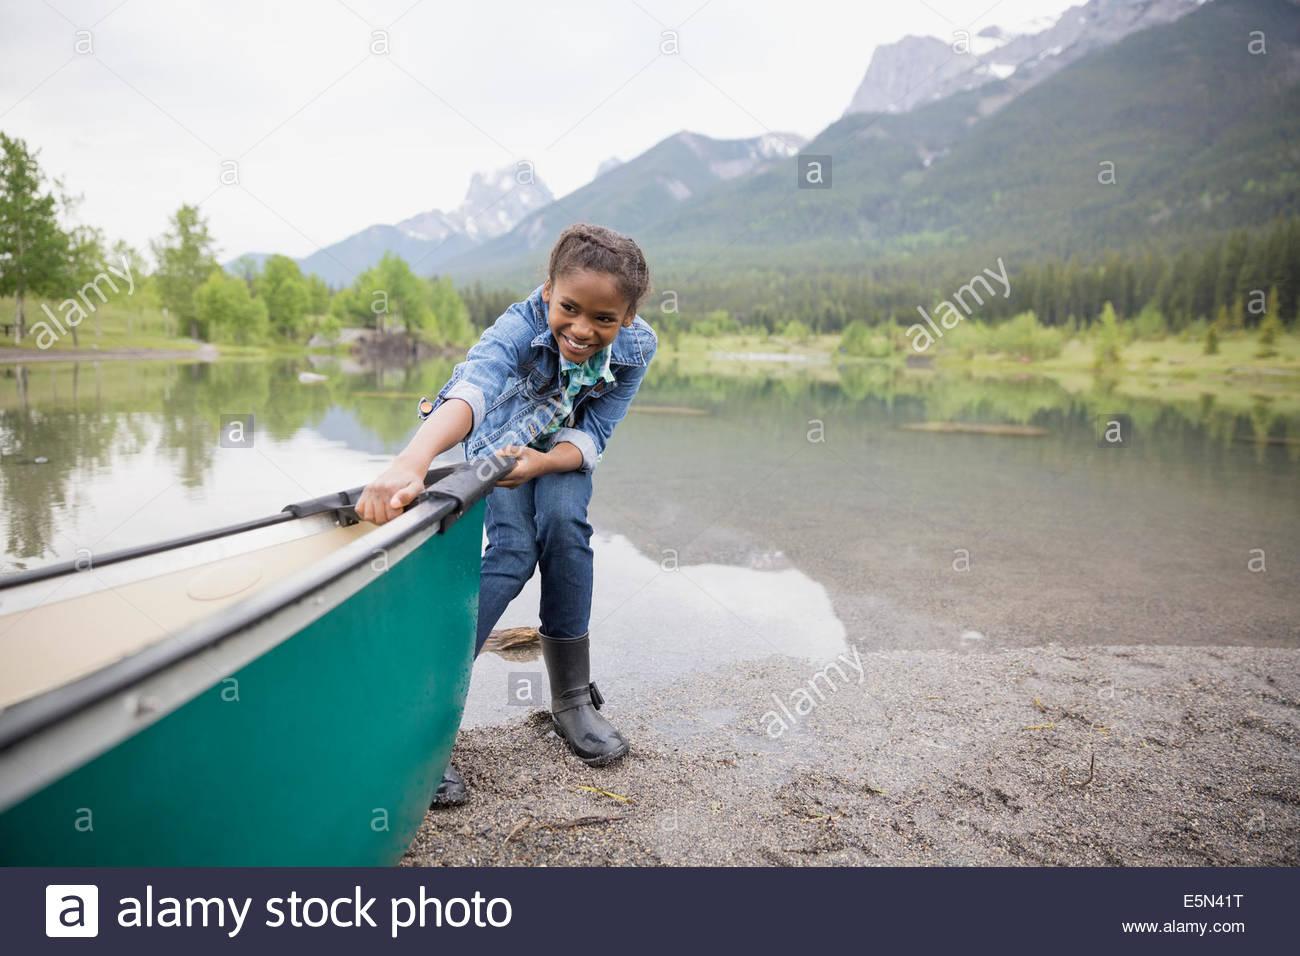 Chica tirando de canoa en el lago Imagen De Stock